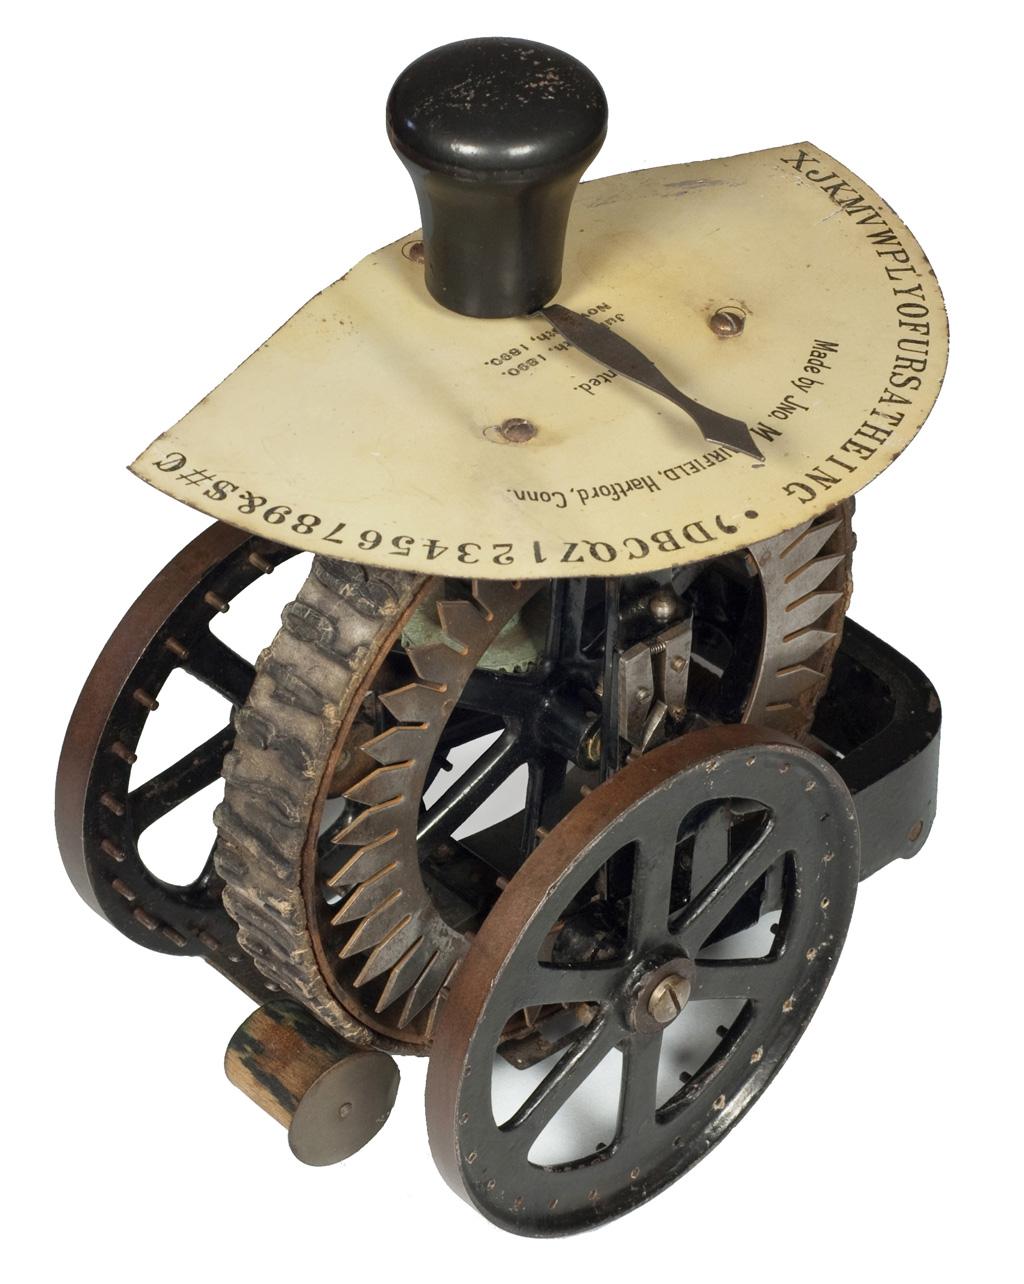 Photograph of the Dart 1 typewriter.